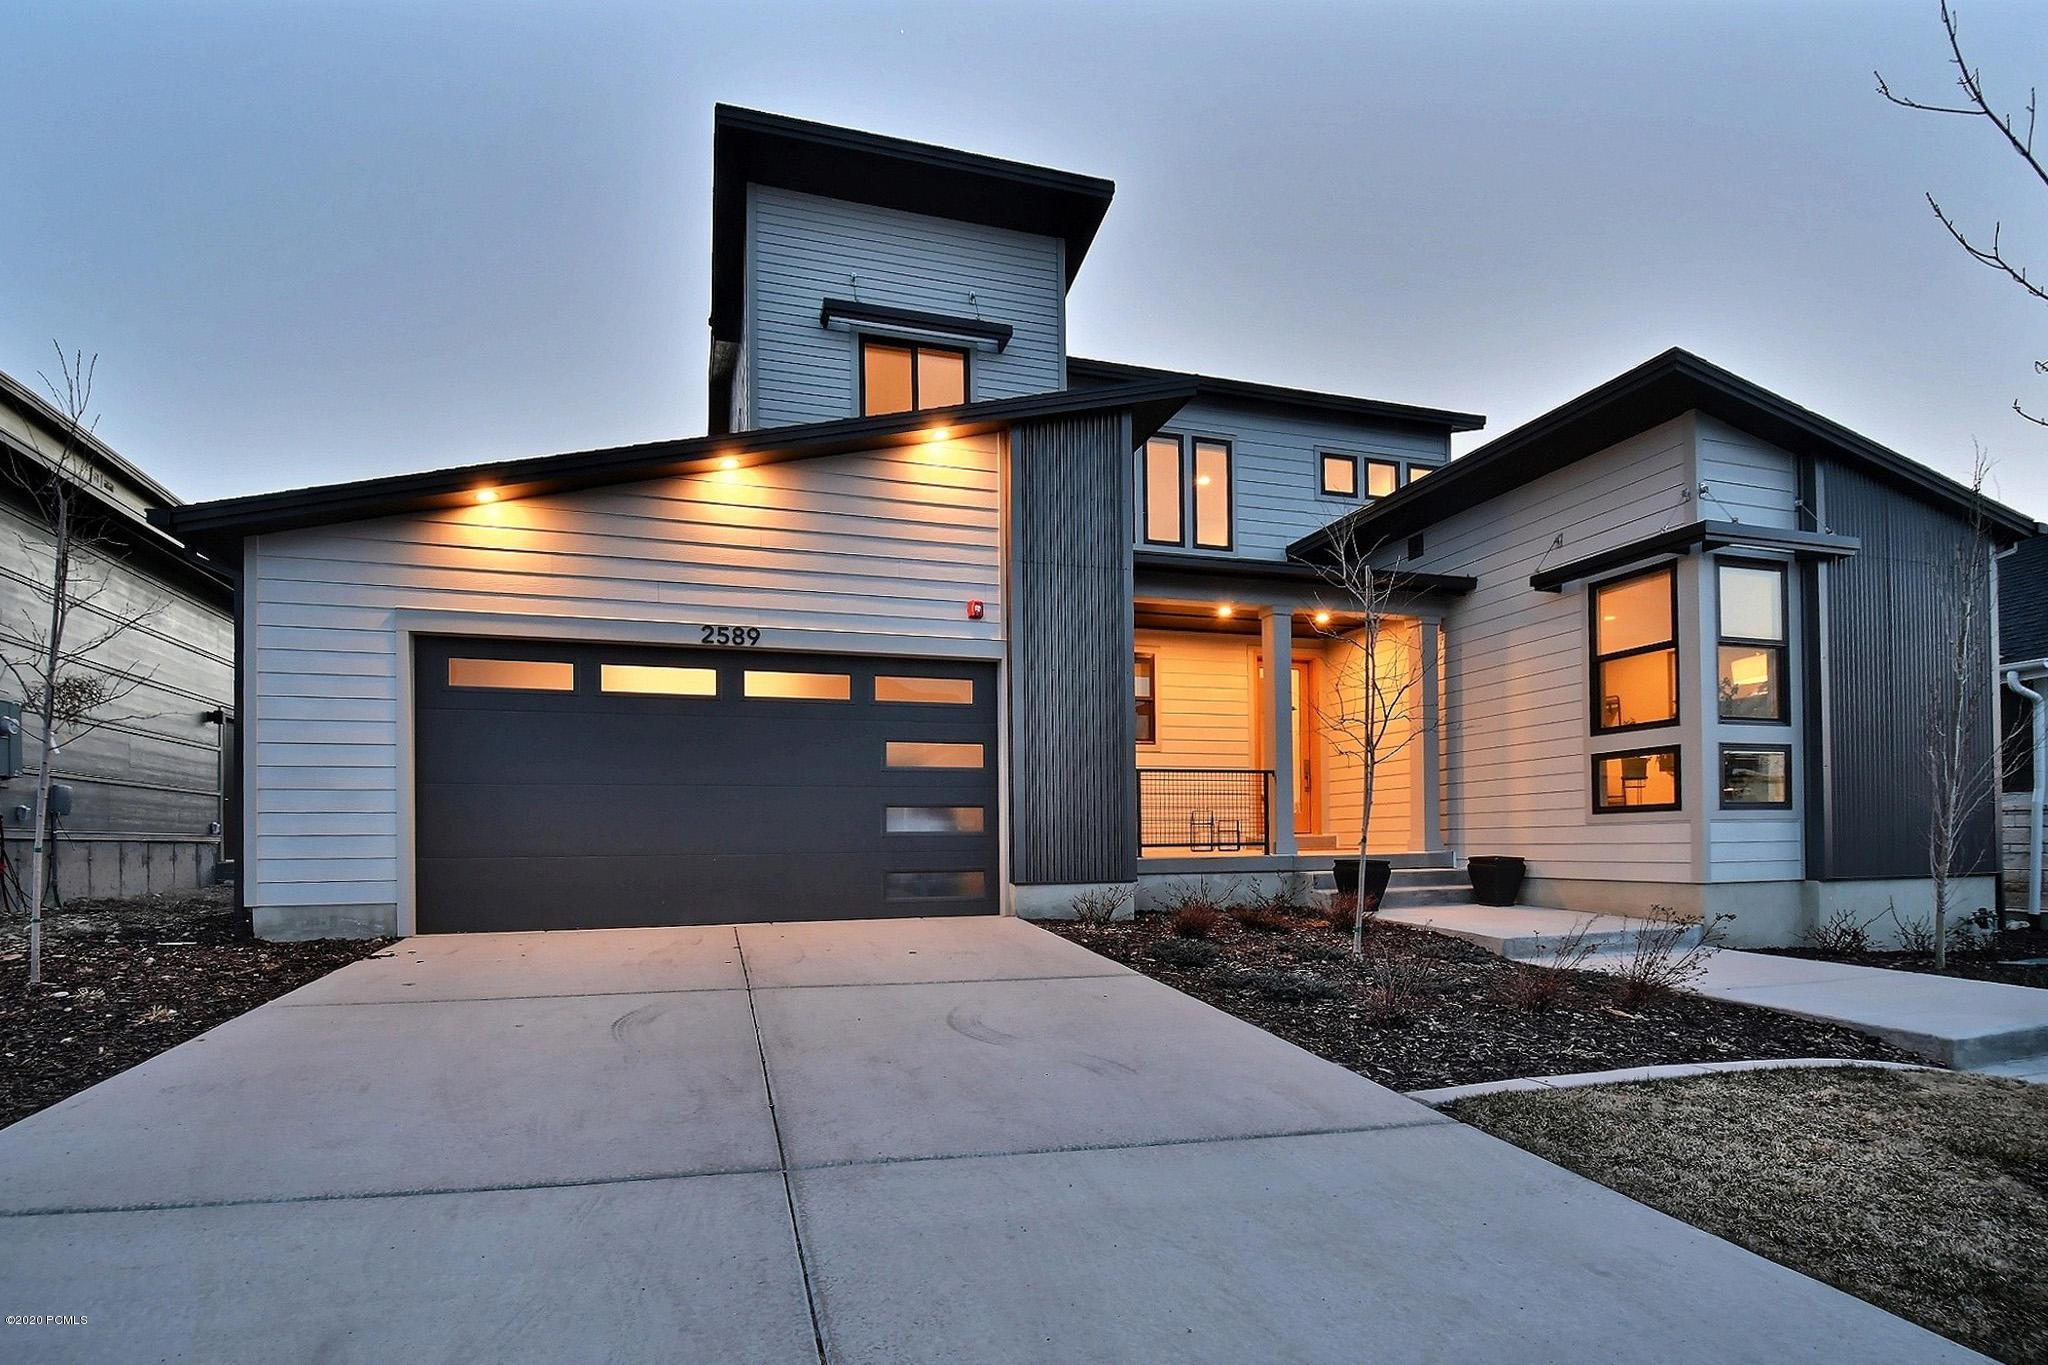 2589 Piper Way, Park City, Utah 84060, 5 Bedrooms Bedrooms, ,4 BathroomsBathrooms,Single Family,For Sale,Piper,20190109112430415765000000